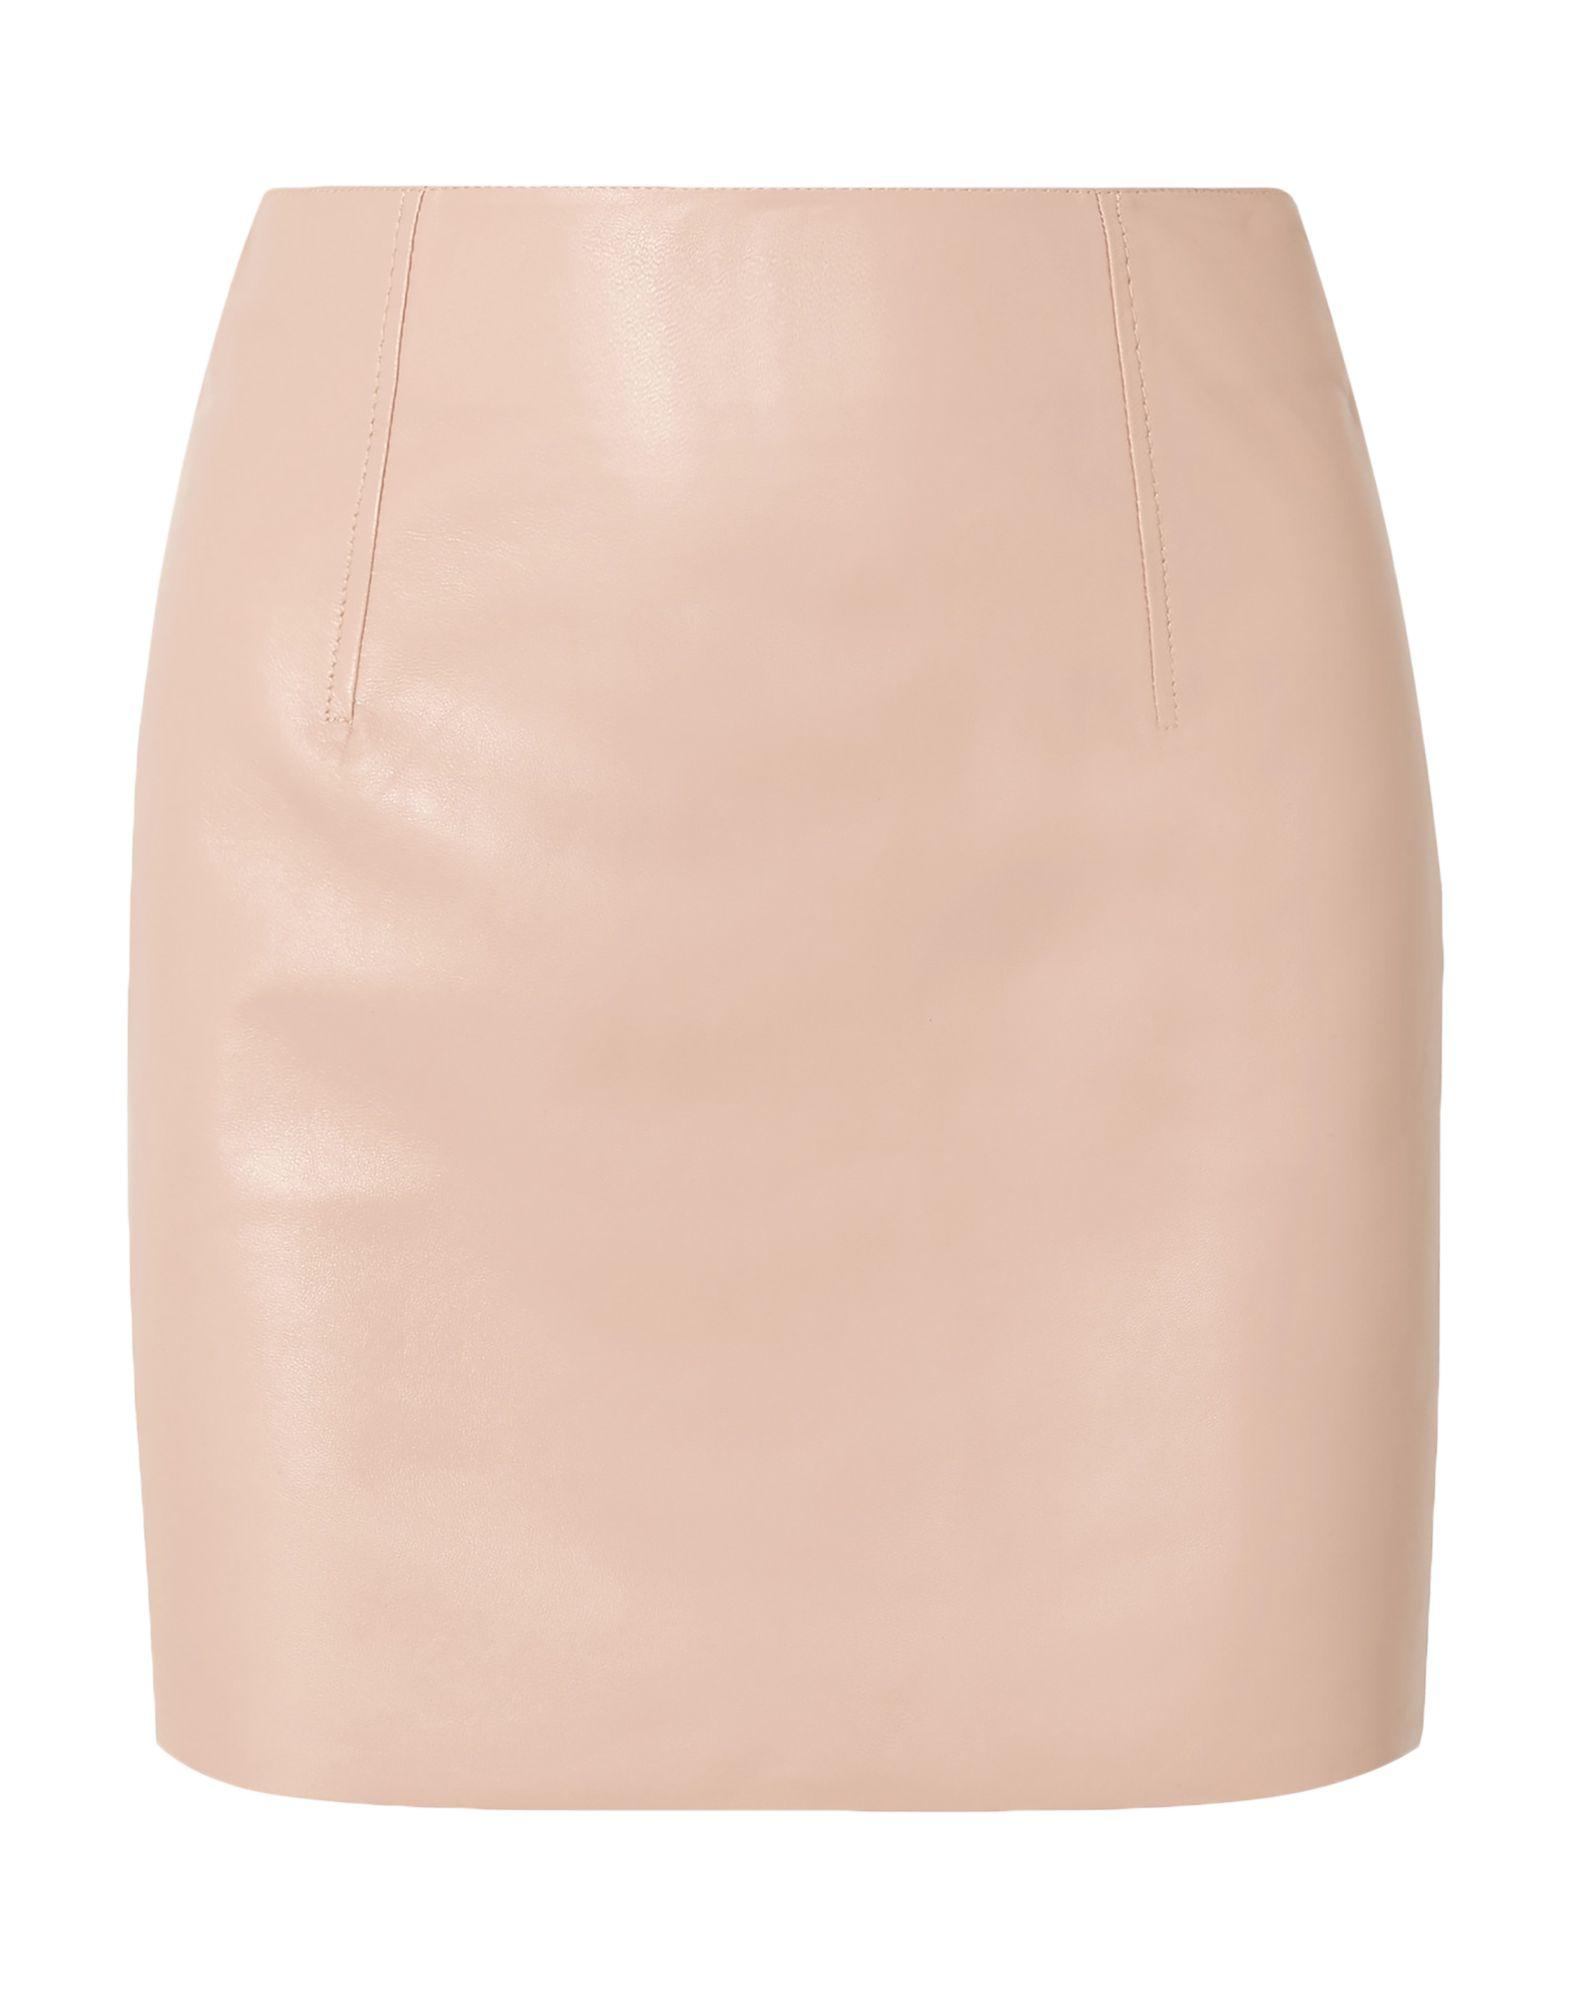 BLOUSE Мини-юбка blouse 0800500 49